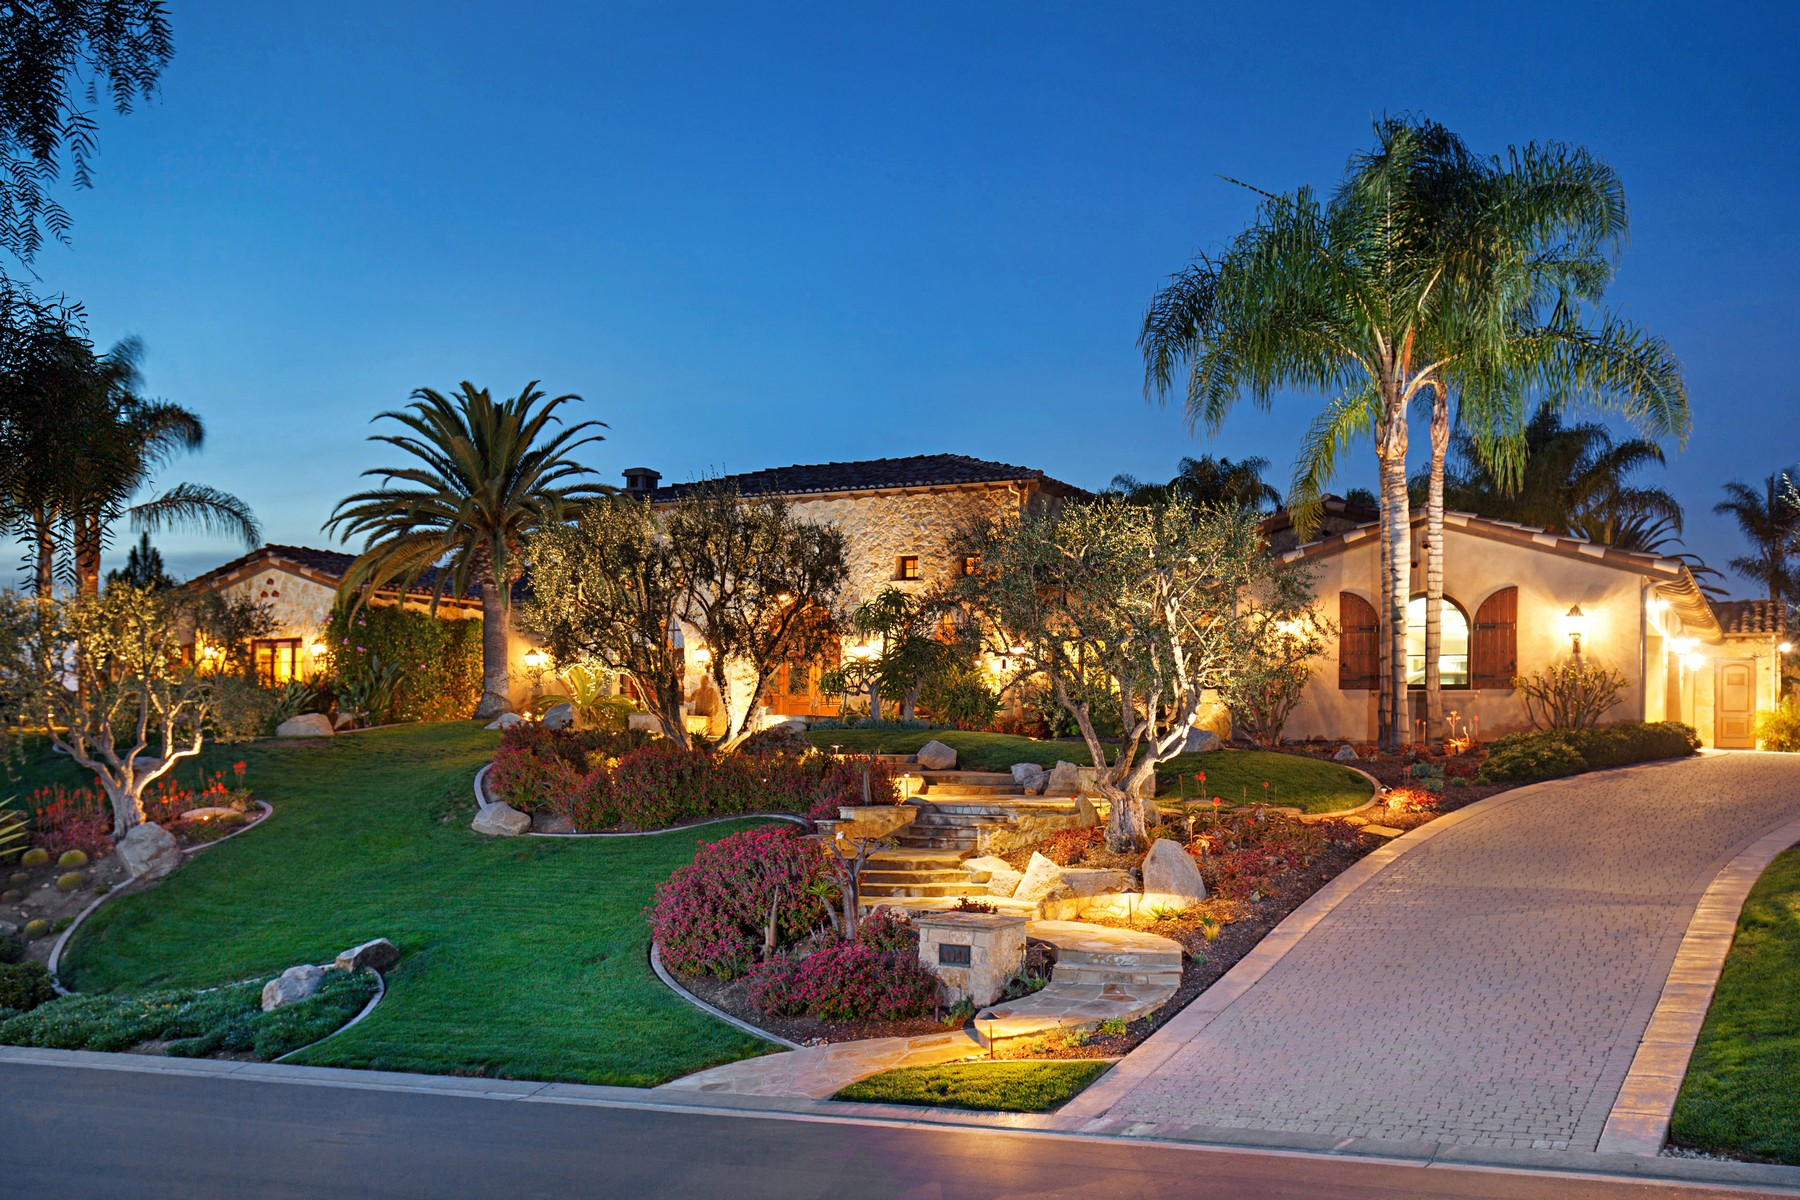 独户住宅 为 销售 在 4920 Rancho Del Mar Trail 圣地亚哥, 92130 美国